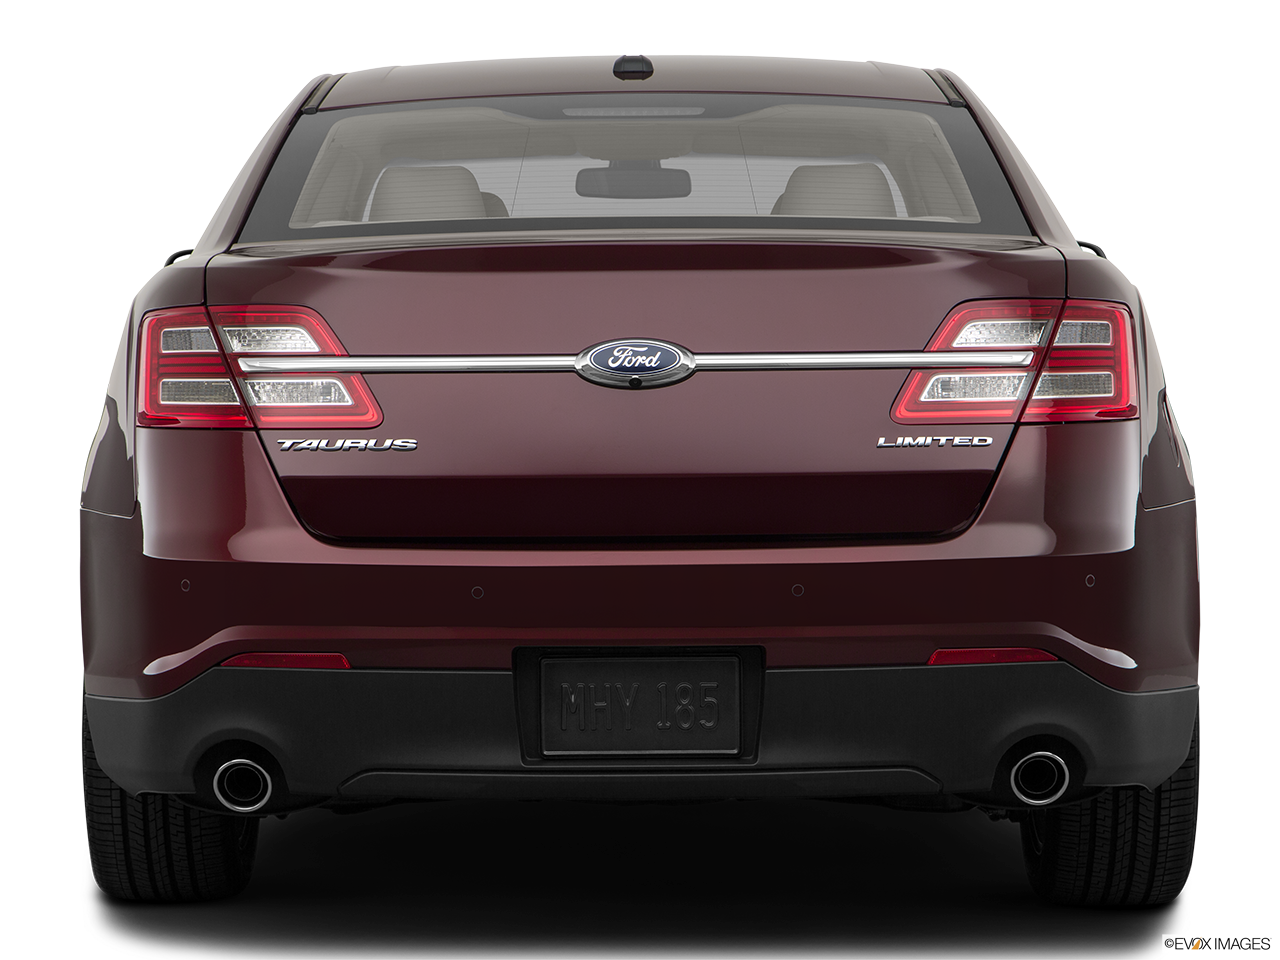 2019 Ford Taurus photo